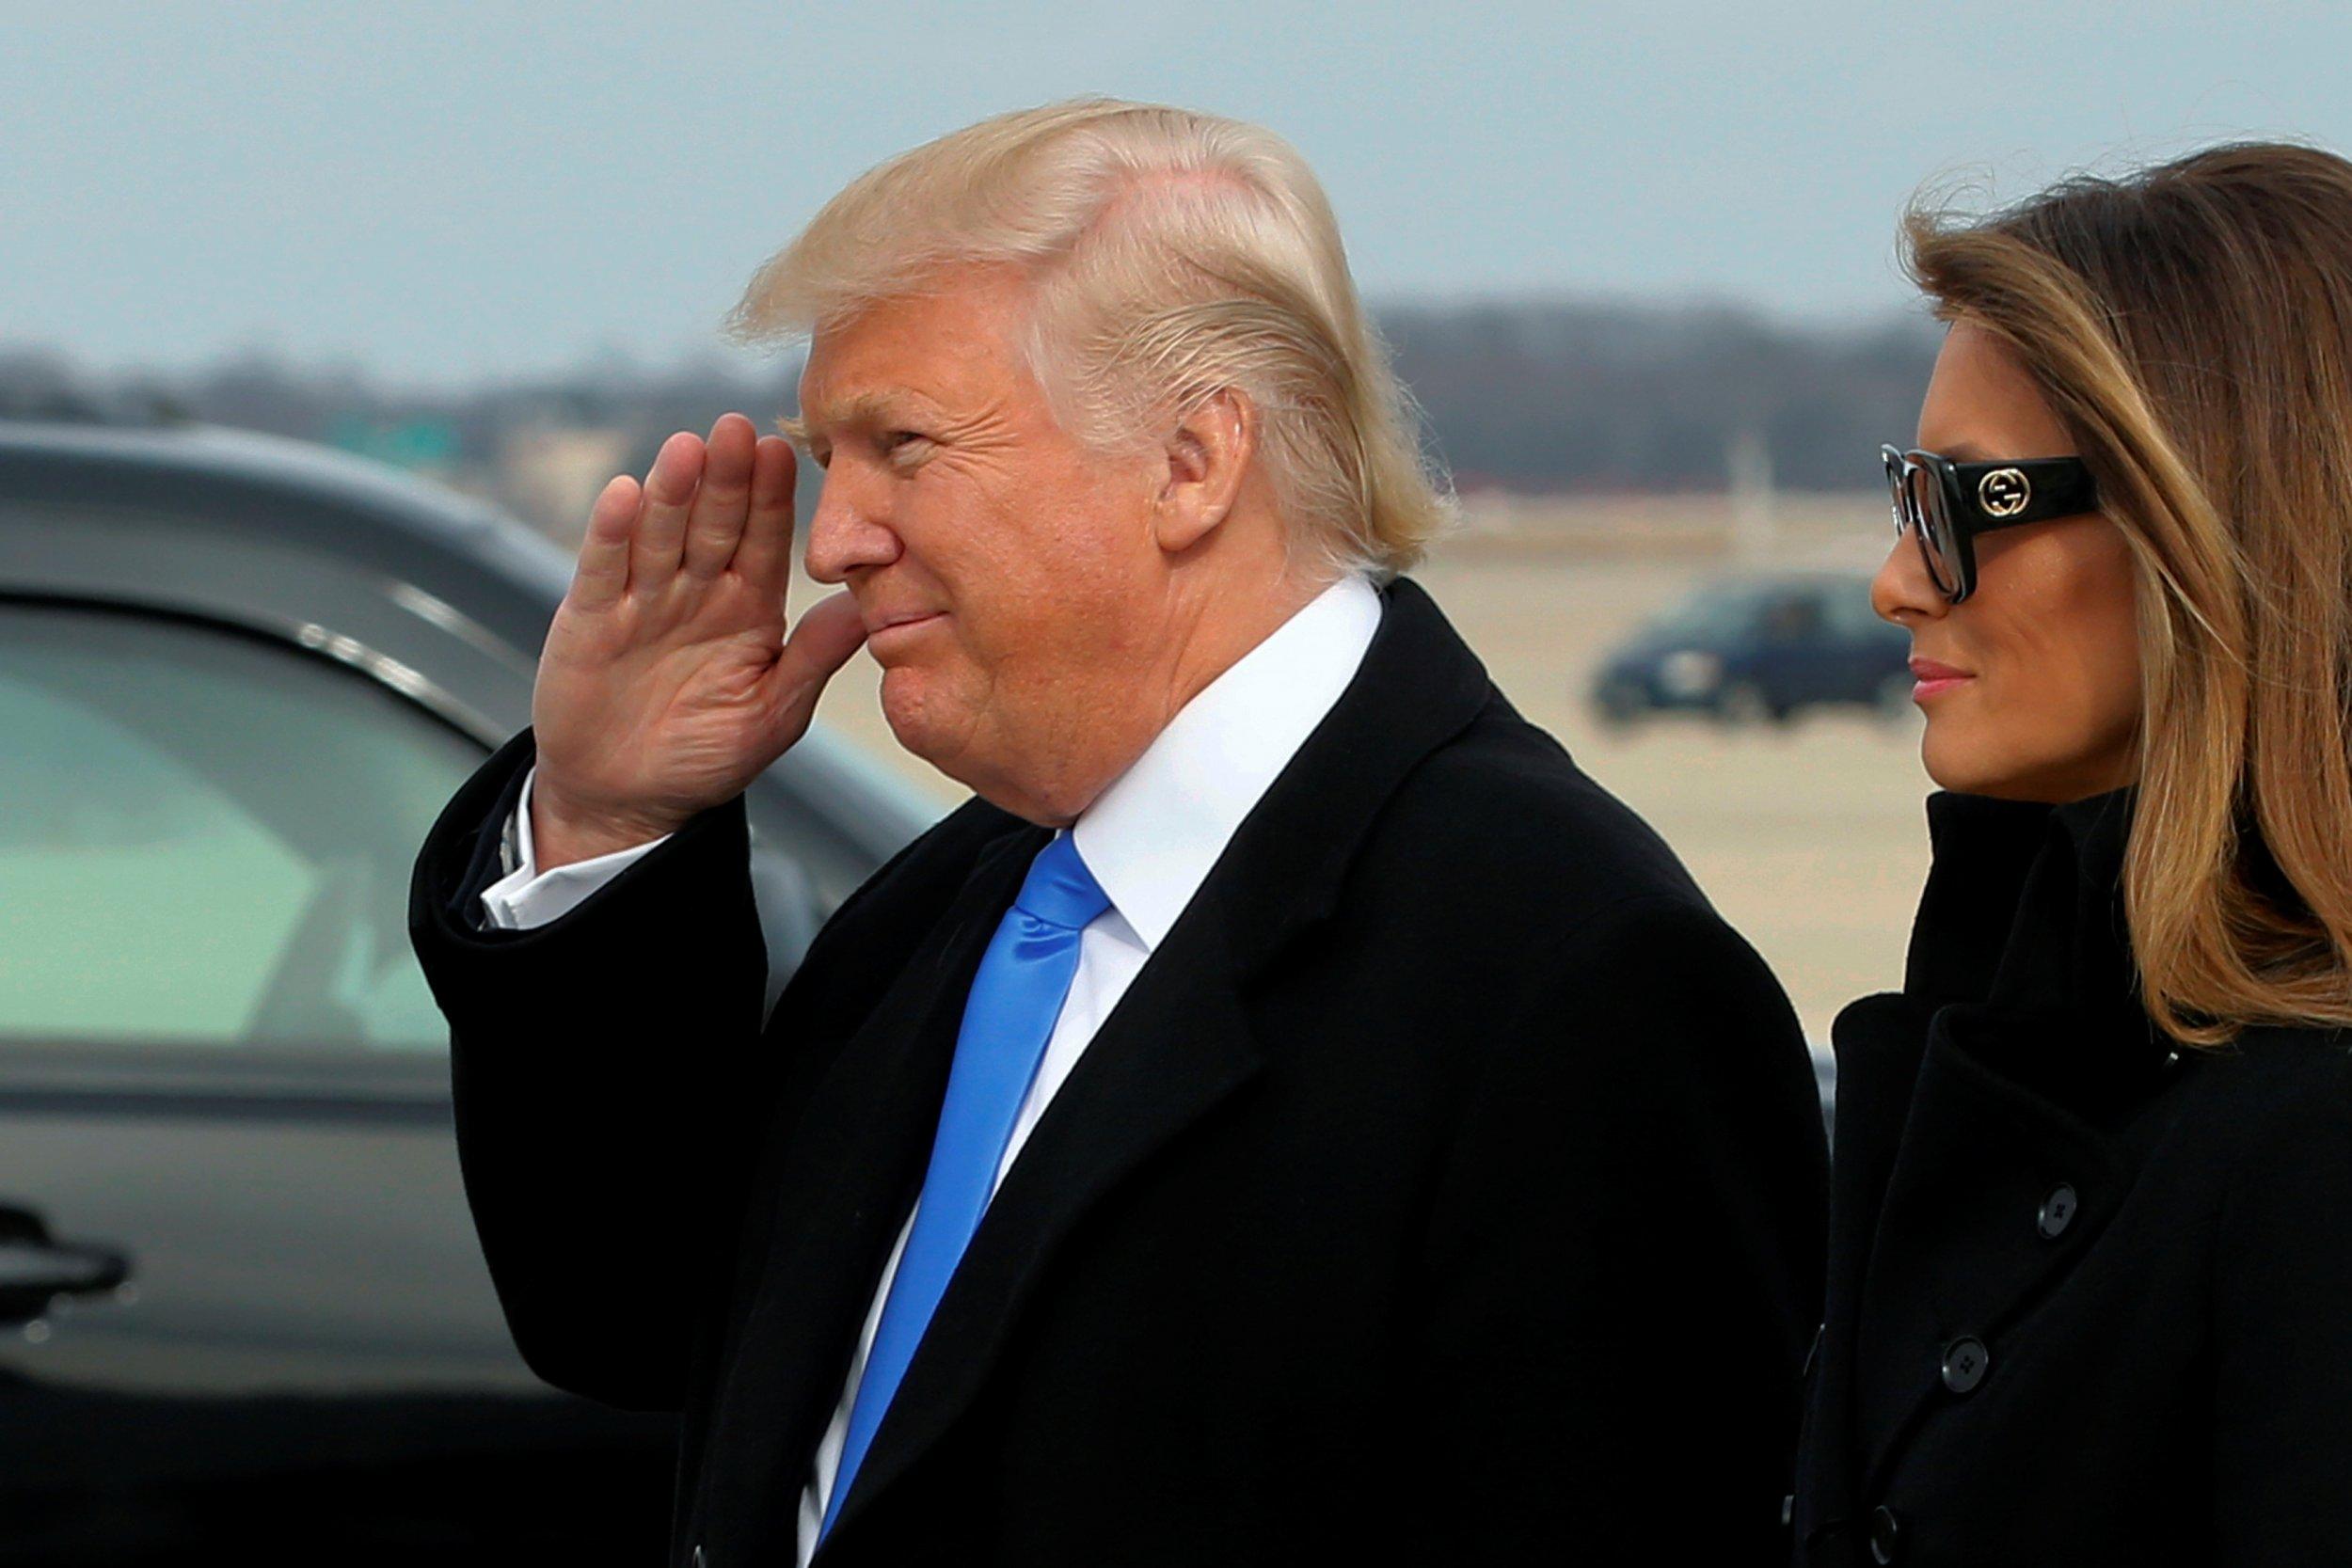 0119_How_to_watch_Trump_inauguration_01